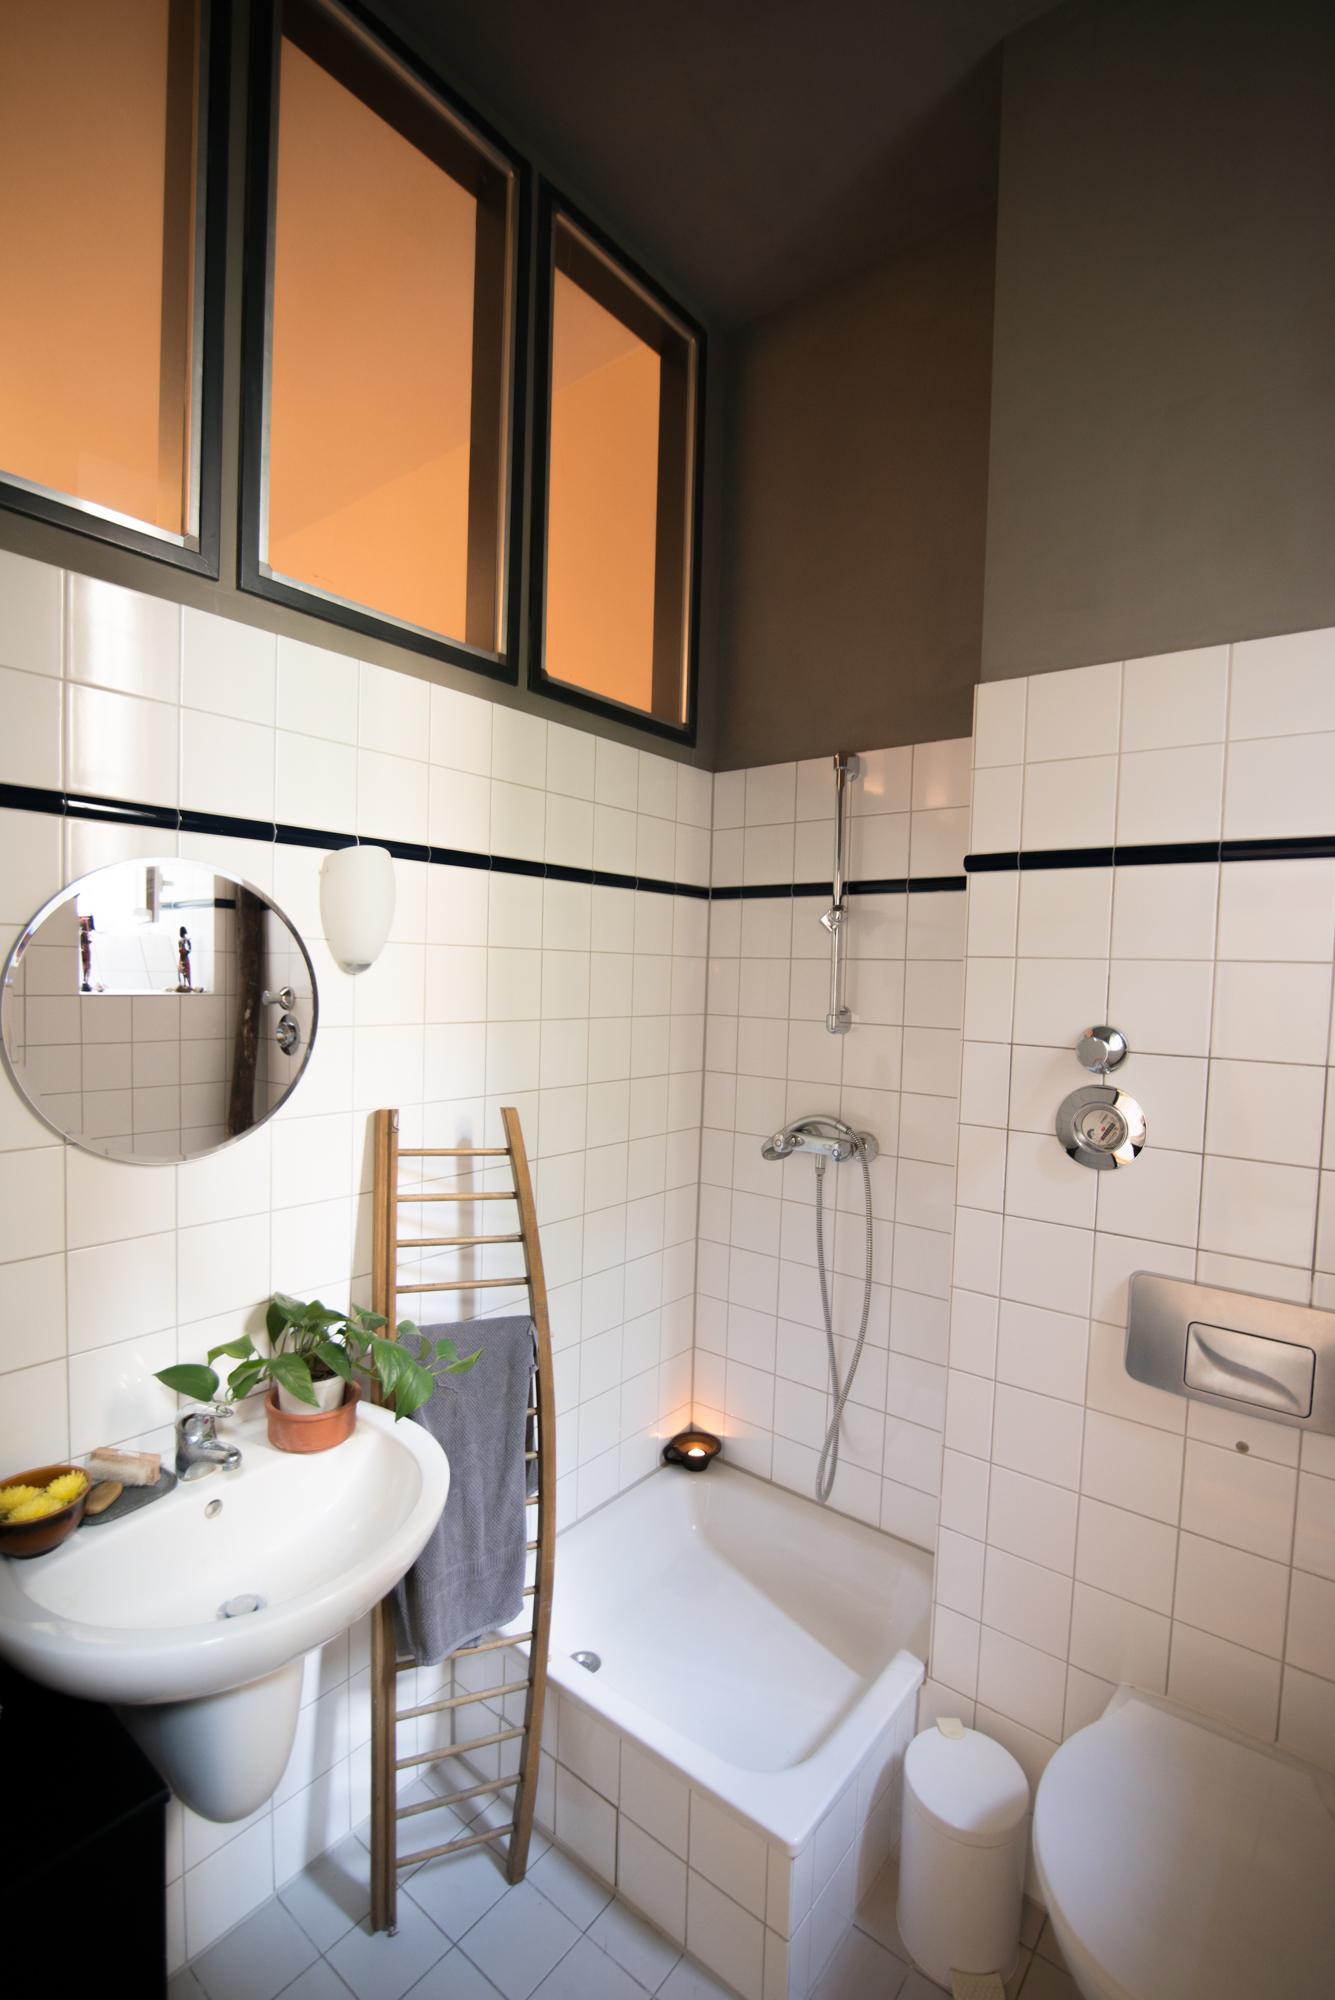 news workshoprooms berlin monkey temple thai massage. Black Bedroom Furniture Sets. Home Design Ideas